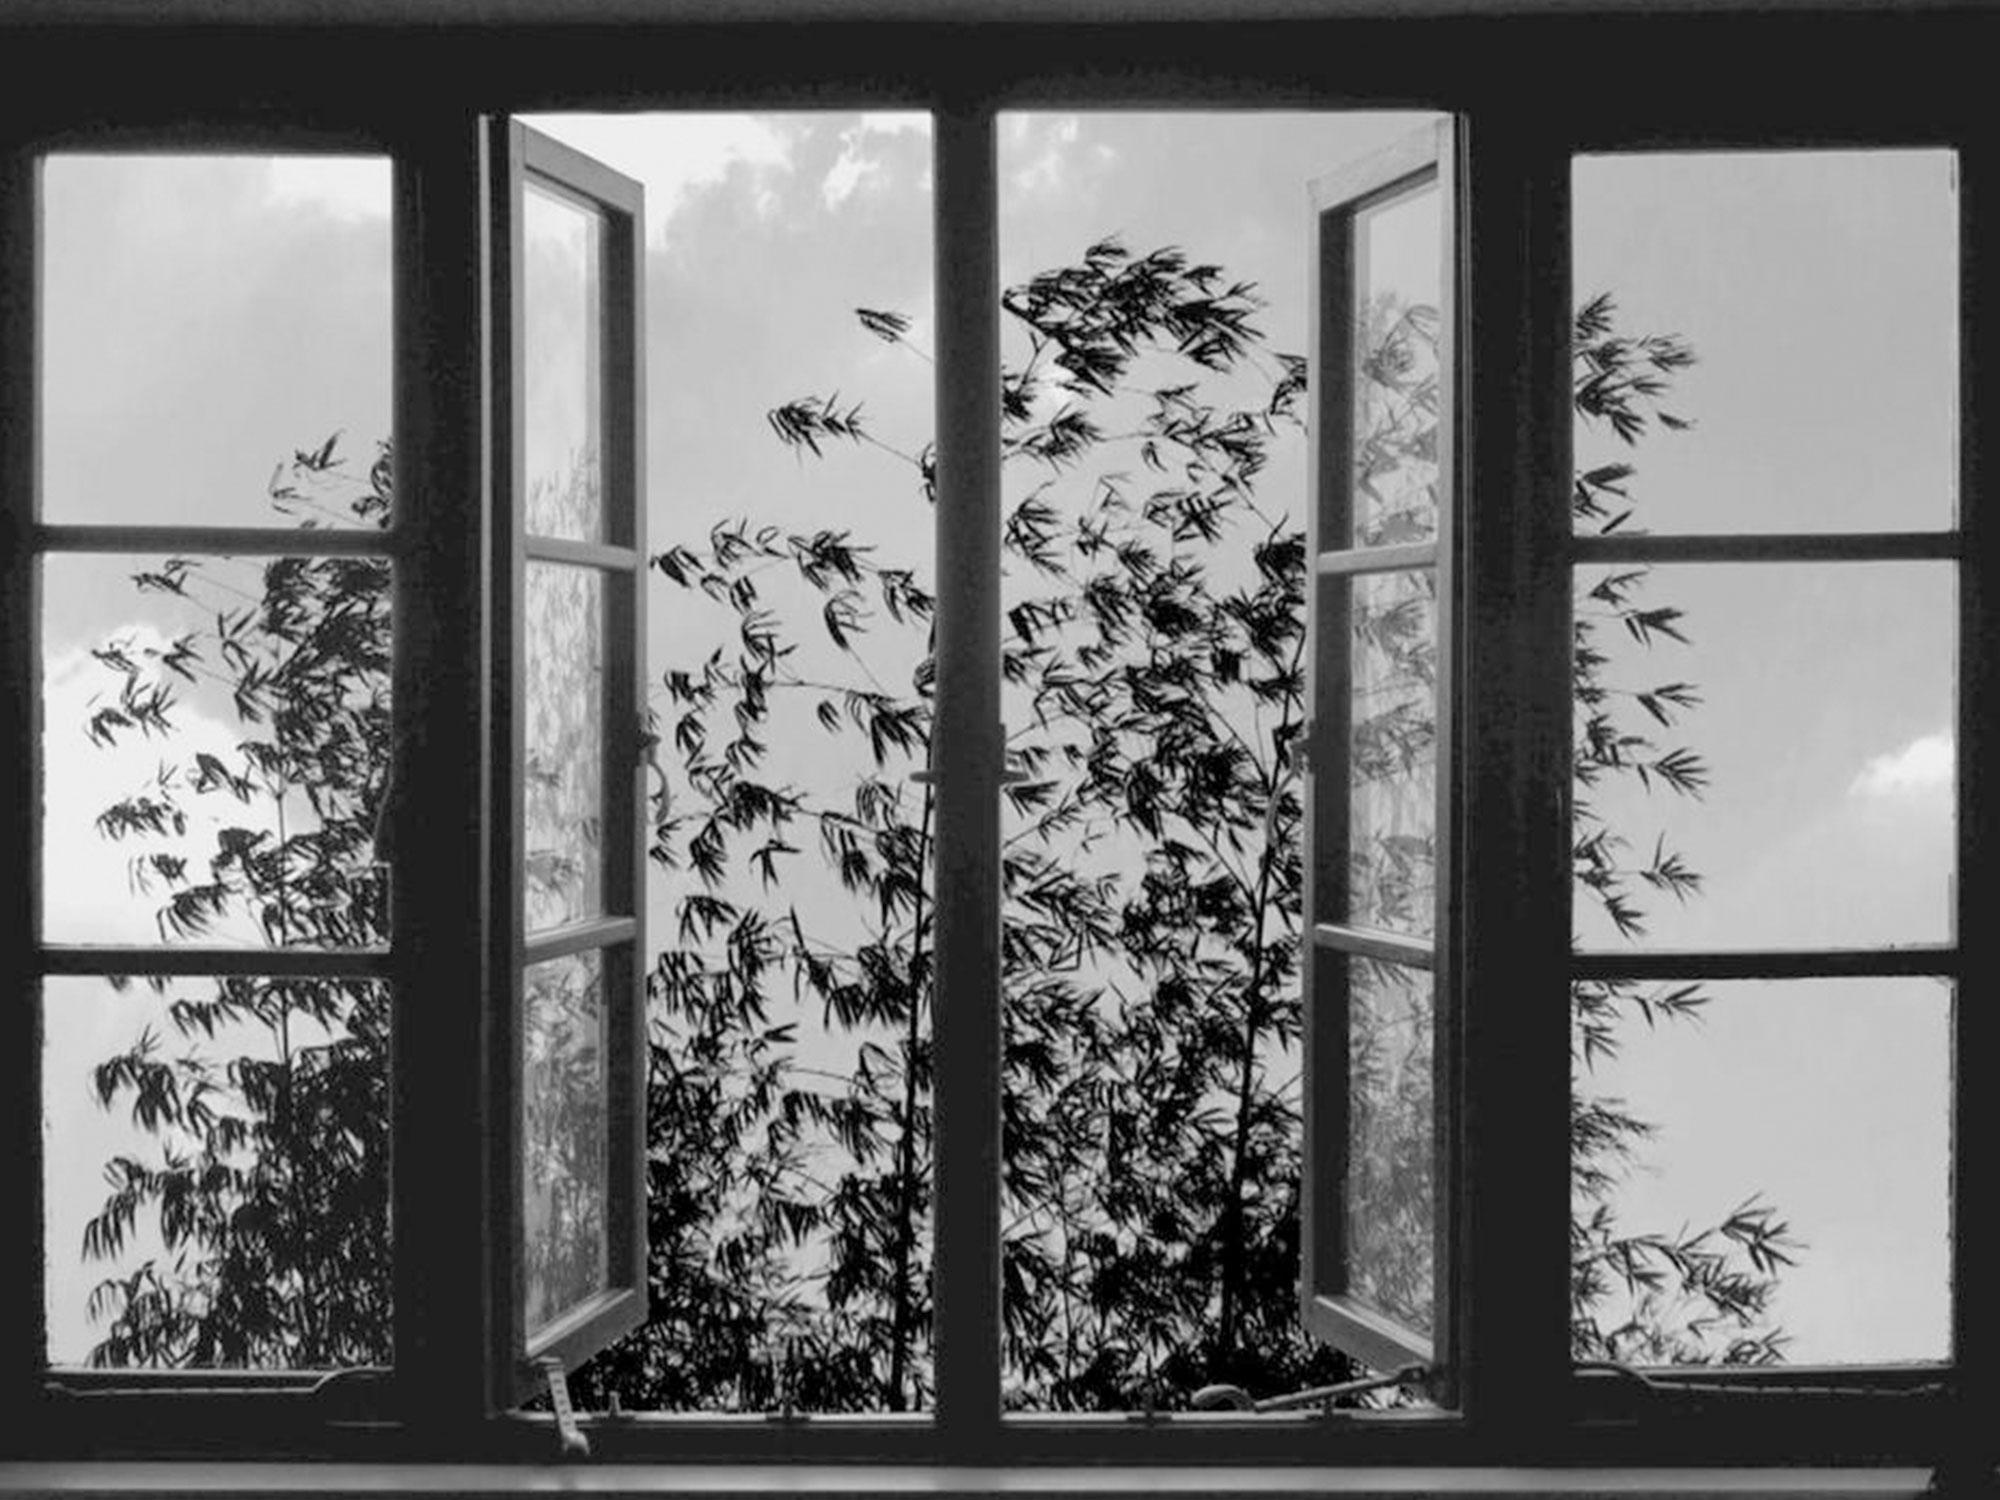 24 Frames - una scena del film di Kiarostami